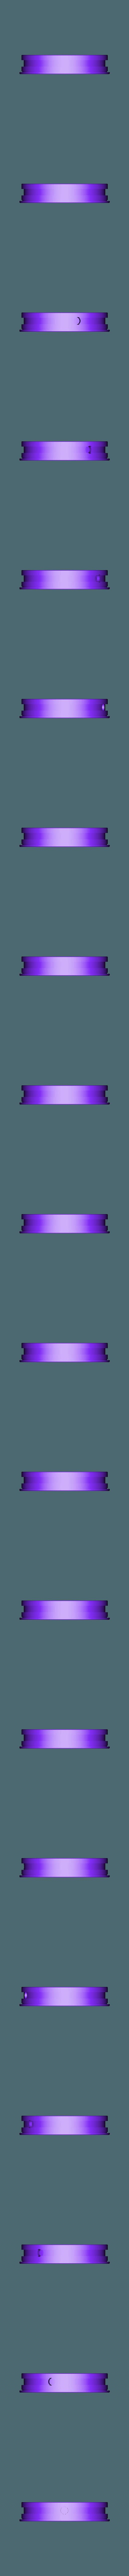 BSR_Berserker_Motor_Adjustor_for_42mm.stl Download free STL file BSR Berserker Motor Mount & Adjustor • 3D printer design, peterbroeders